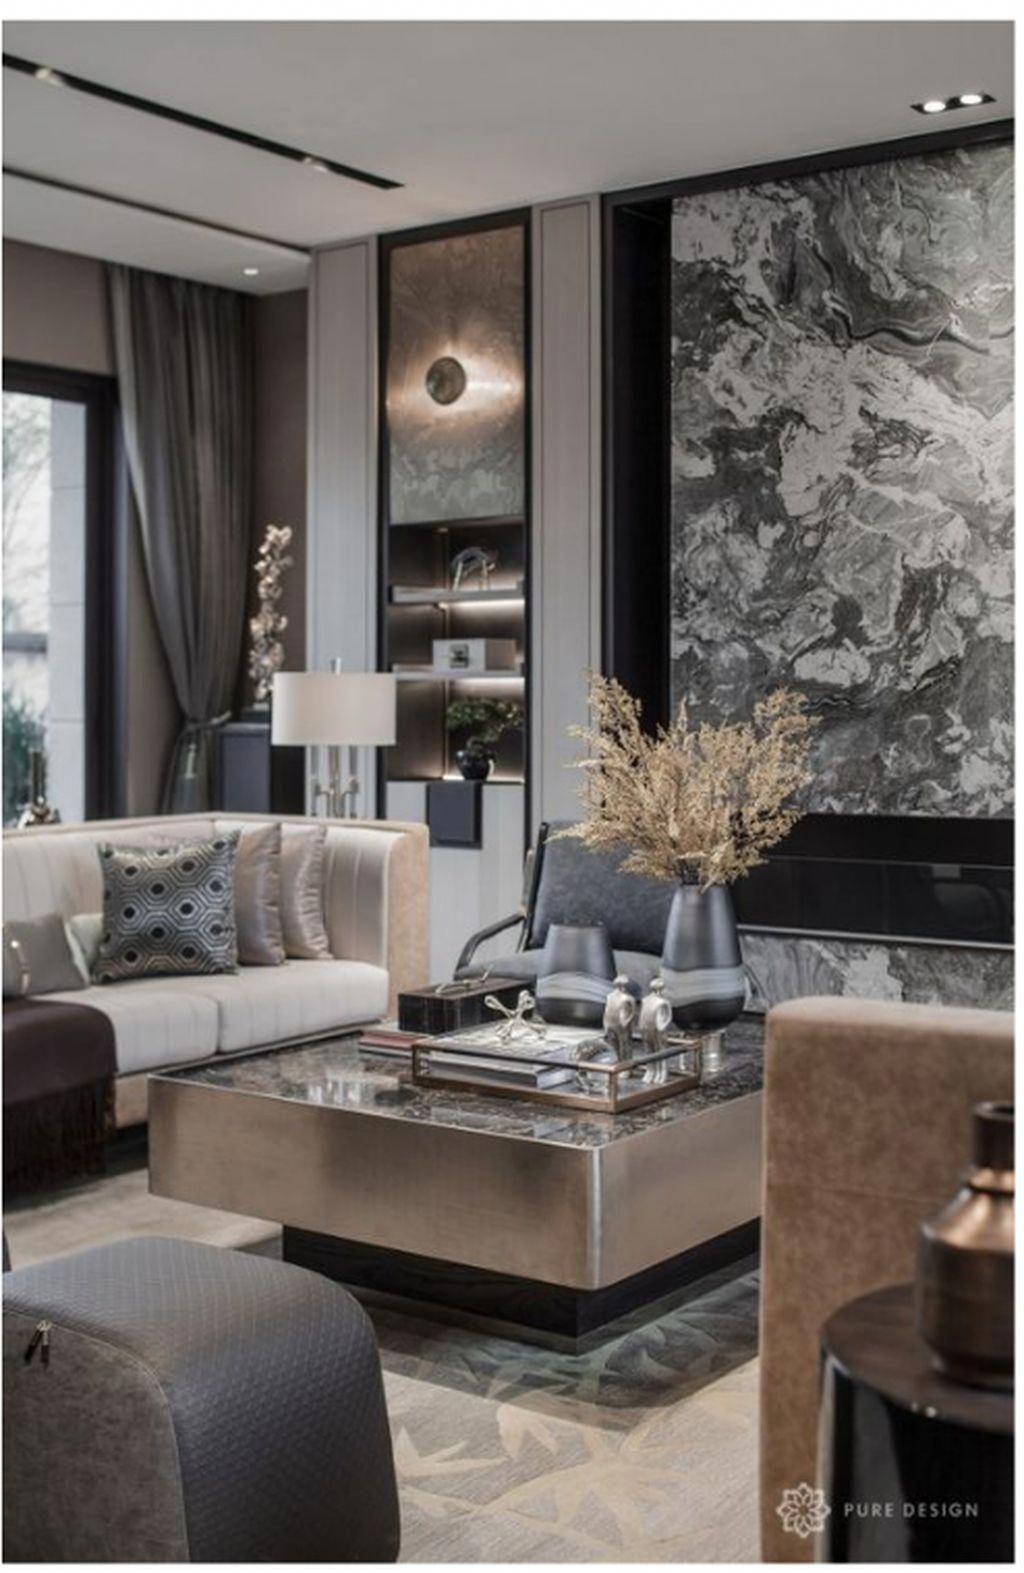 50 Cozy And Elegant Chinese Living Room Decoration Ideas Contemporarylivingroomdecorideas Asian Living Rooms Luxury Living Room Modern Style Living Room Asian decor living room